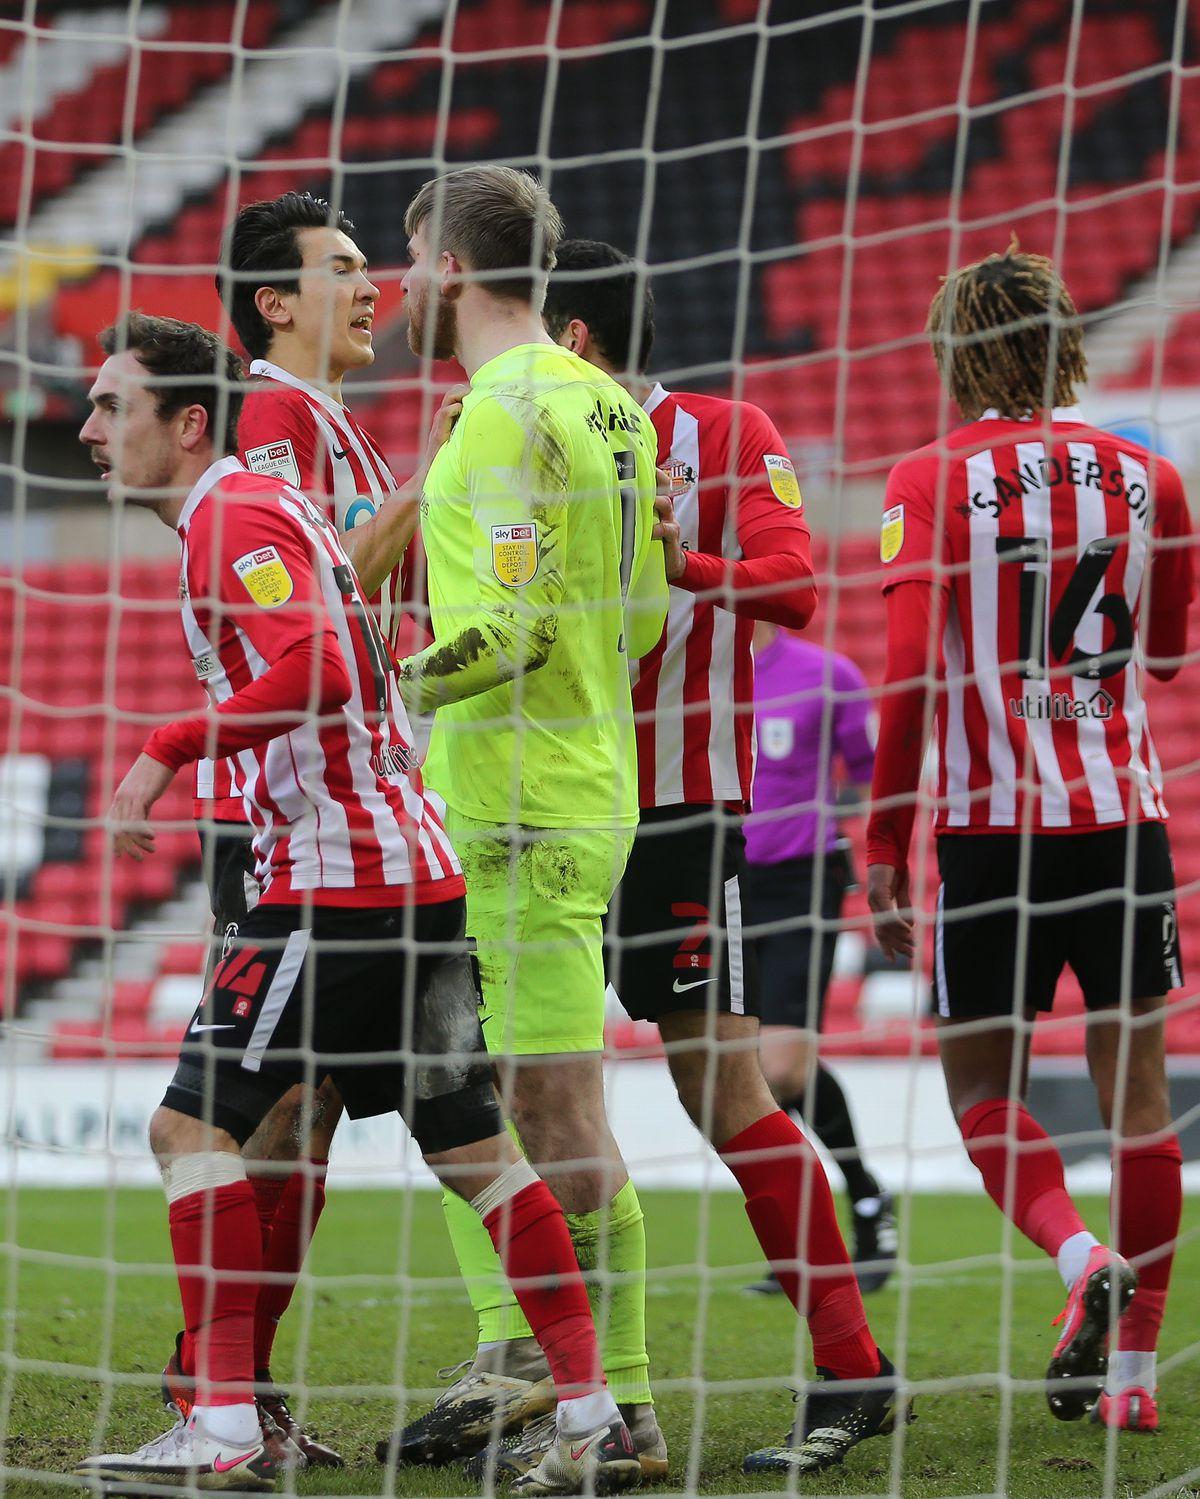 Sunderland v Doncaster Rovers - Sky Bet League One